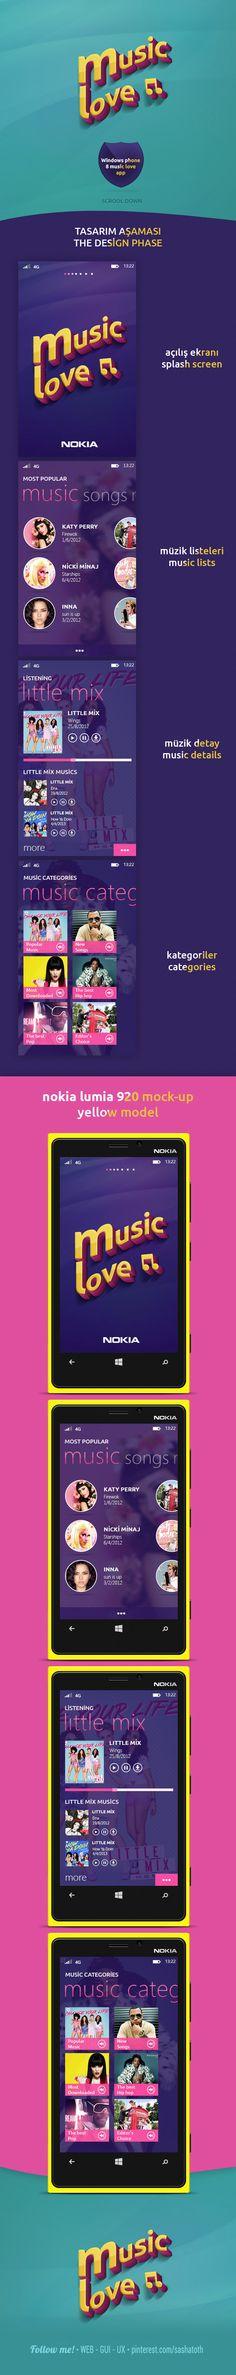 Windows phone 8 music love app by Fatih Ocak *** #app #gui #ux #wp8 #behance